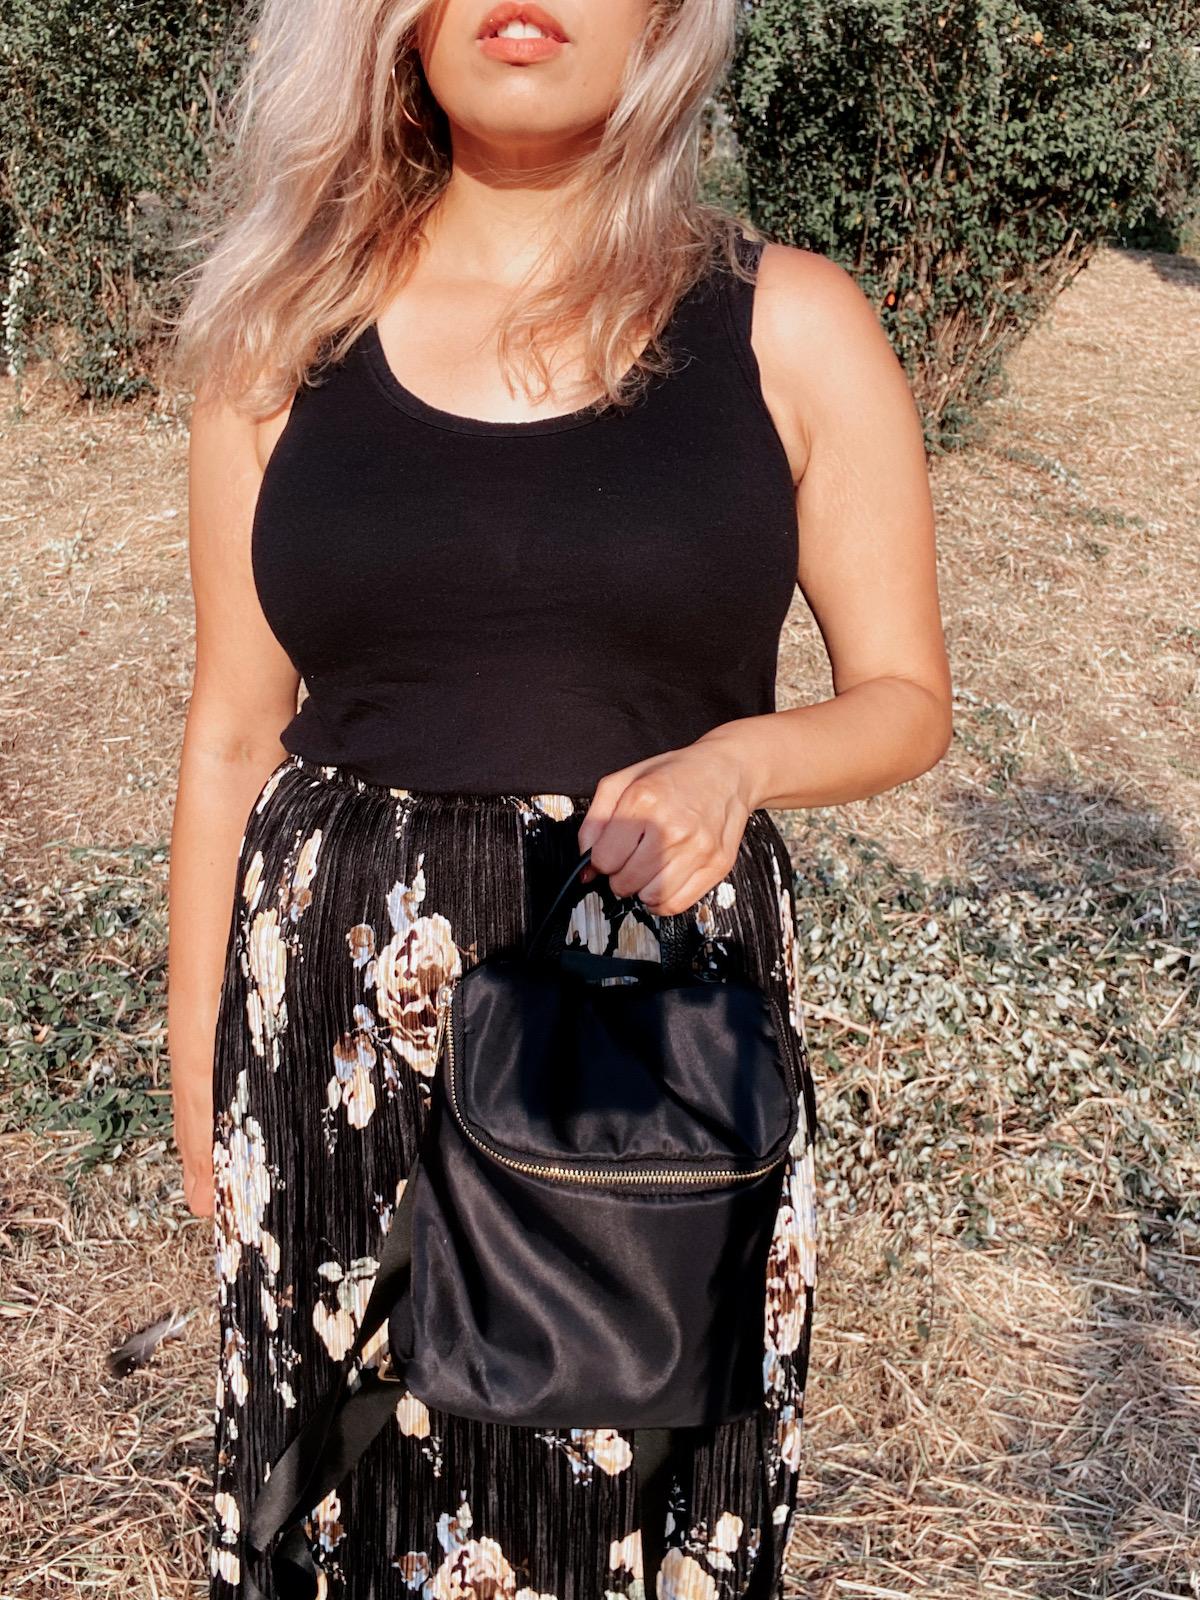 purse backpack target